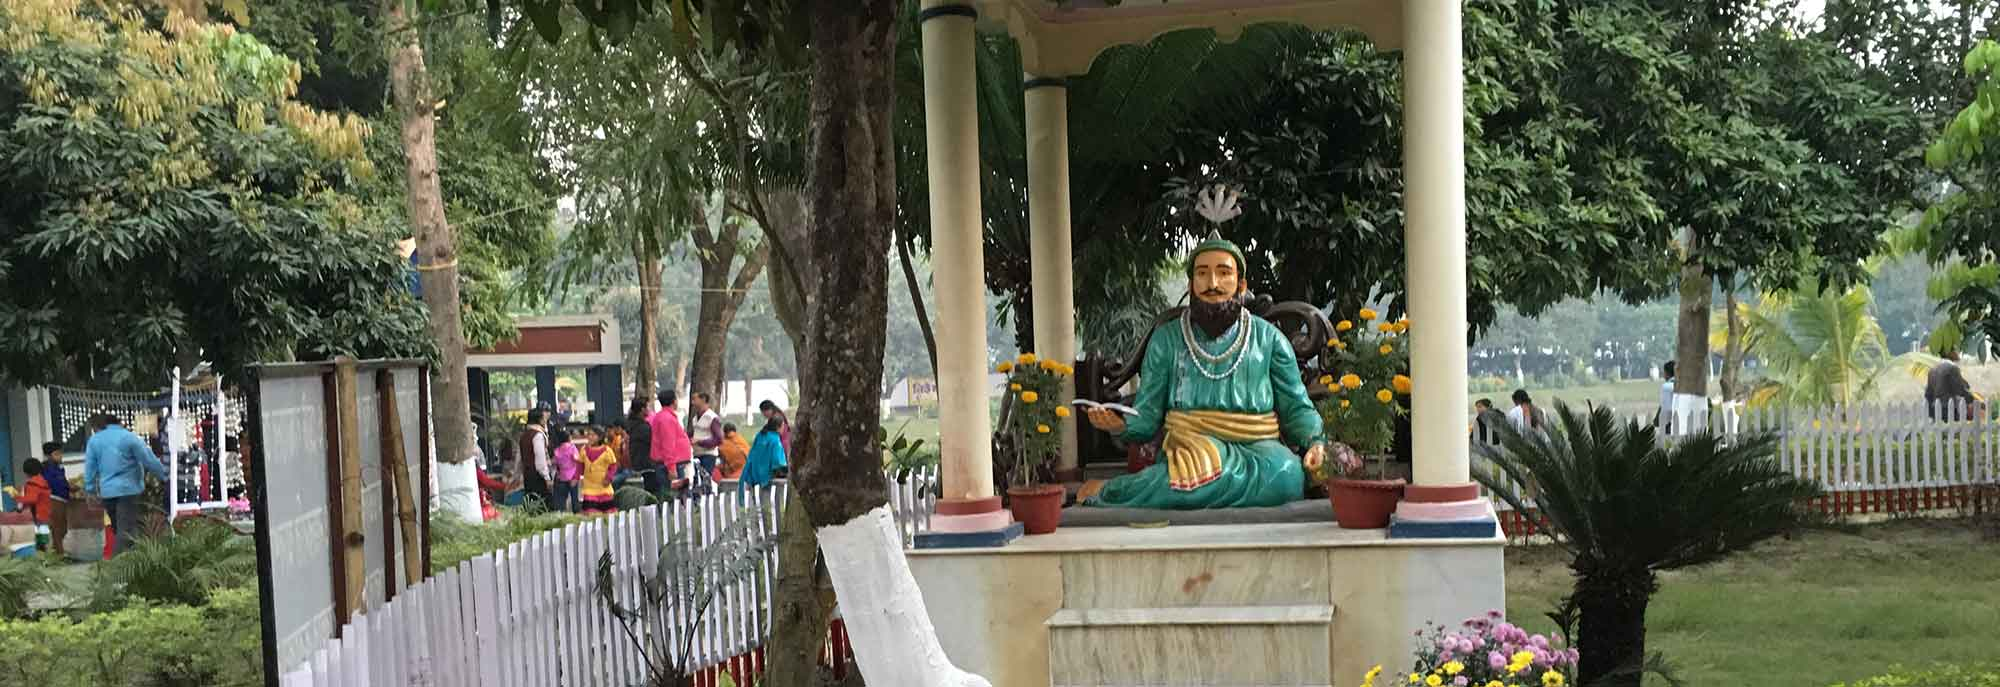 Statues of the Nawabs of Murshidabad